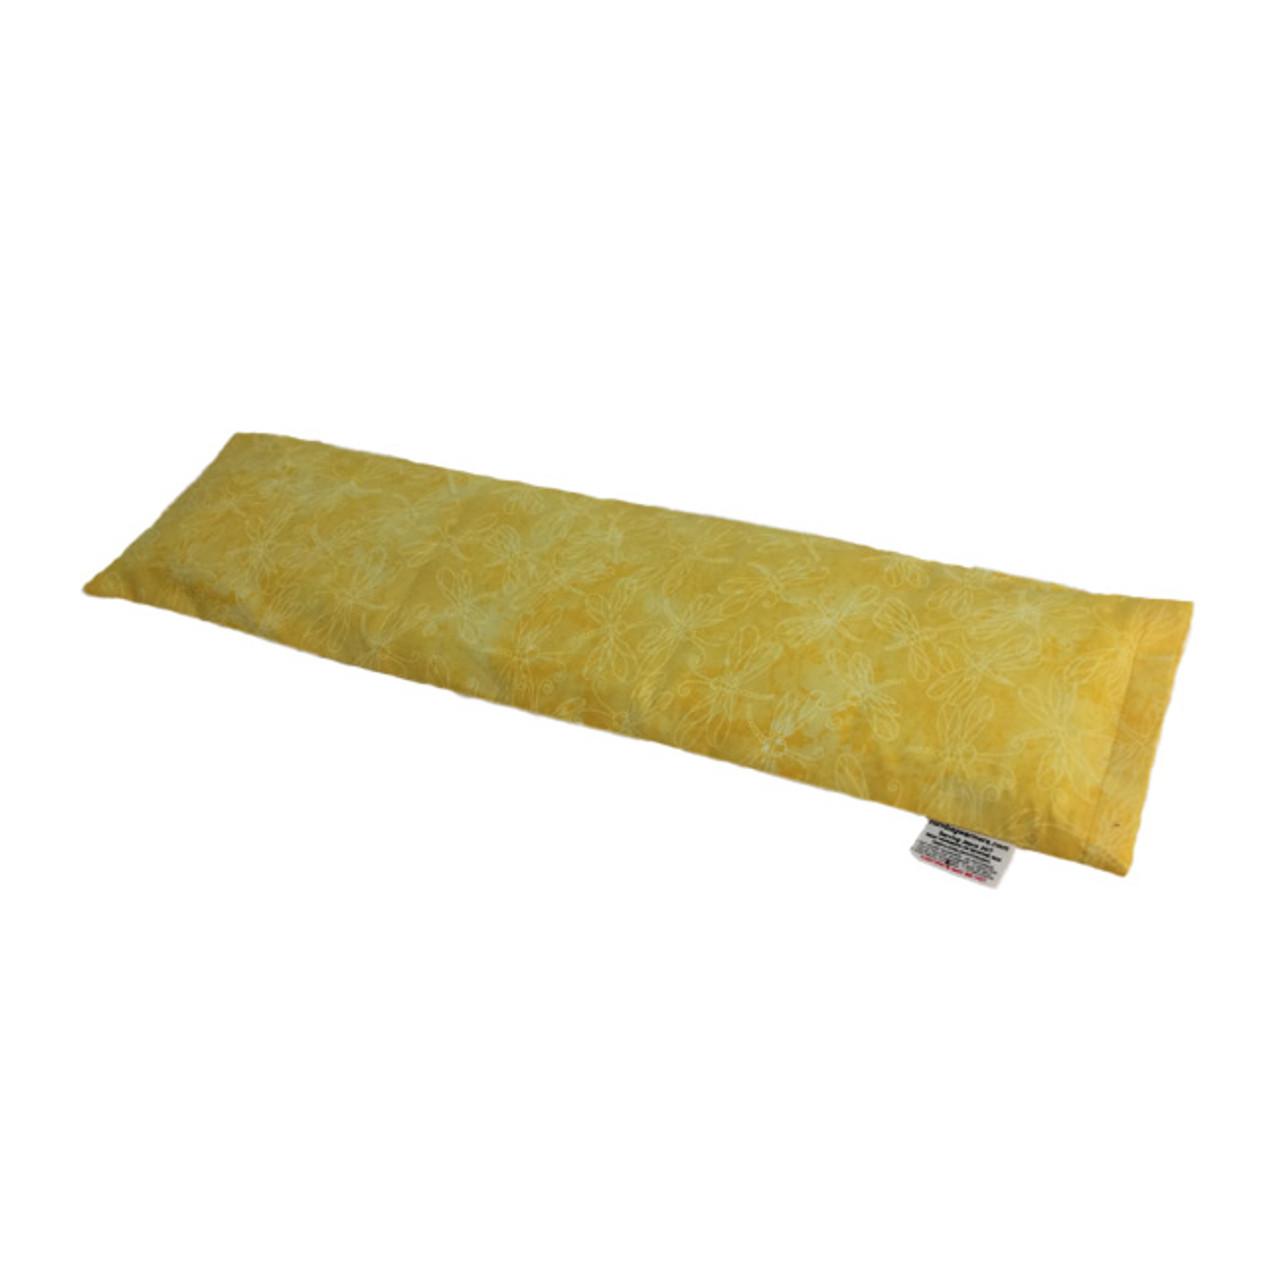 Golden Dragonflies Neck Warmer Microwave Heating Pad